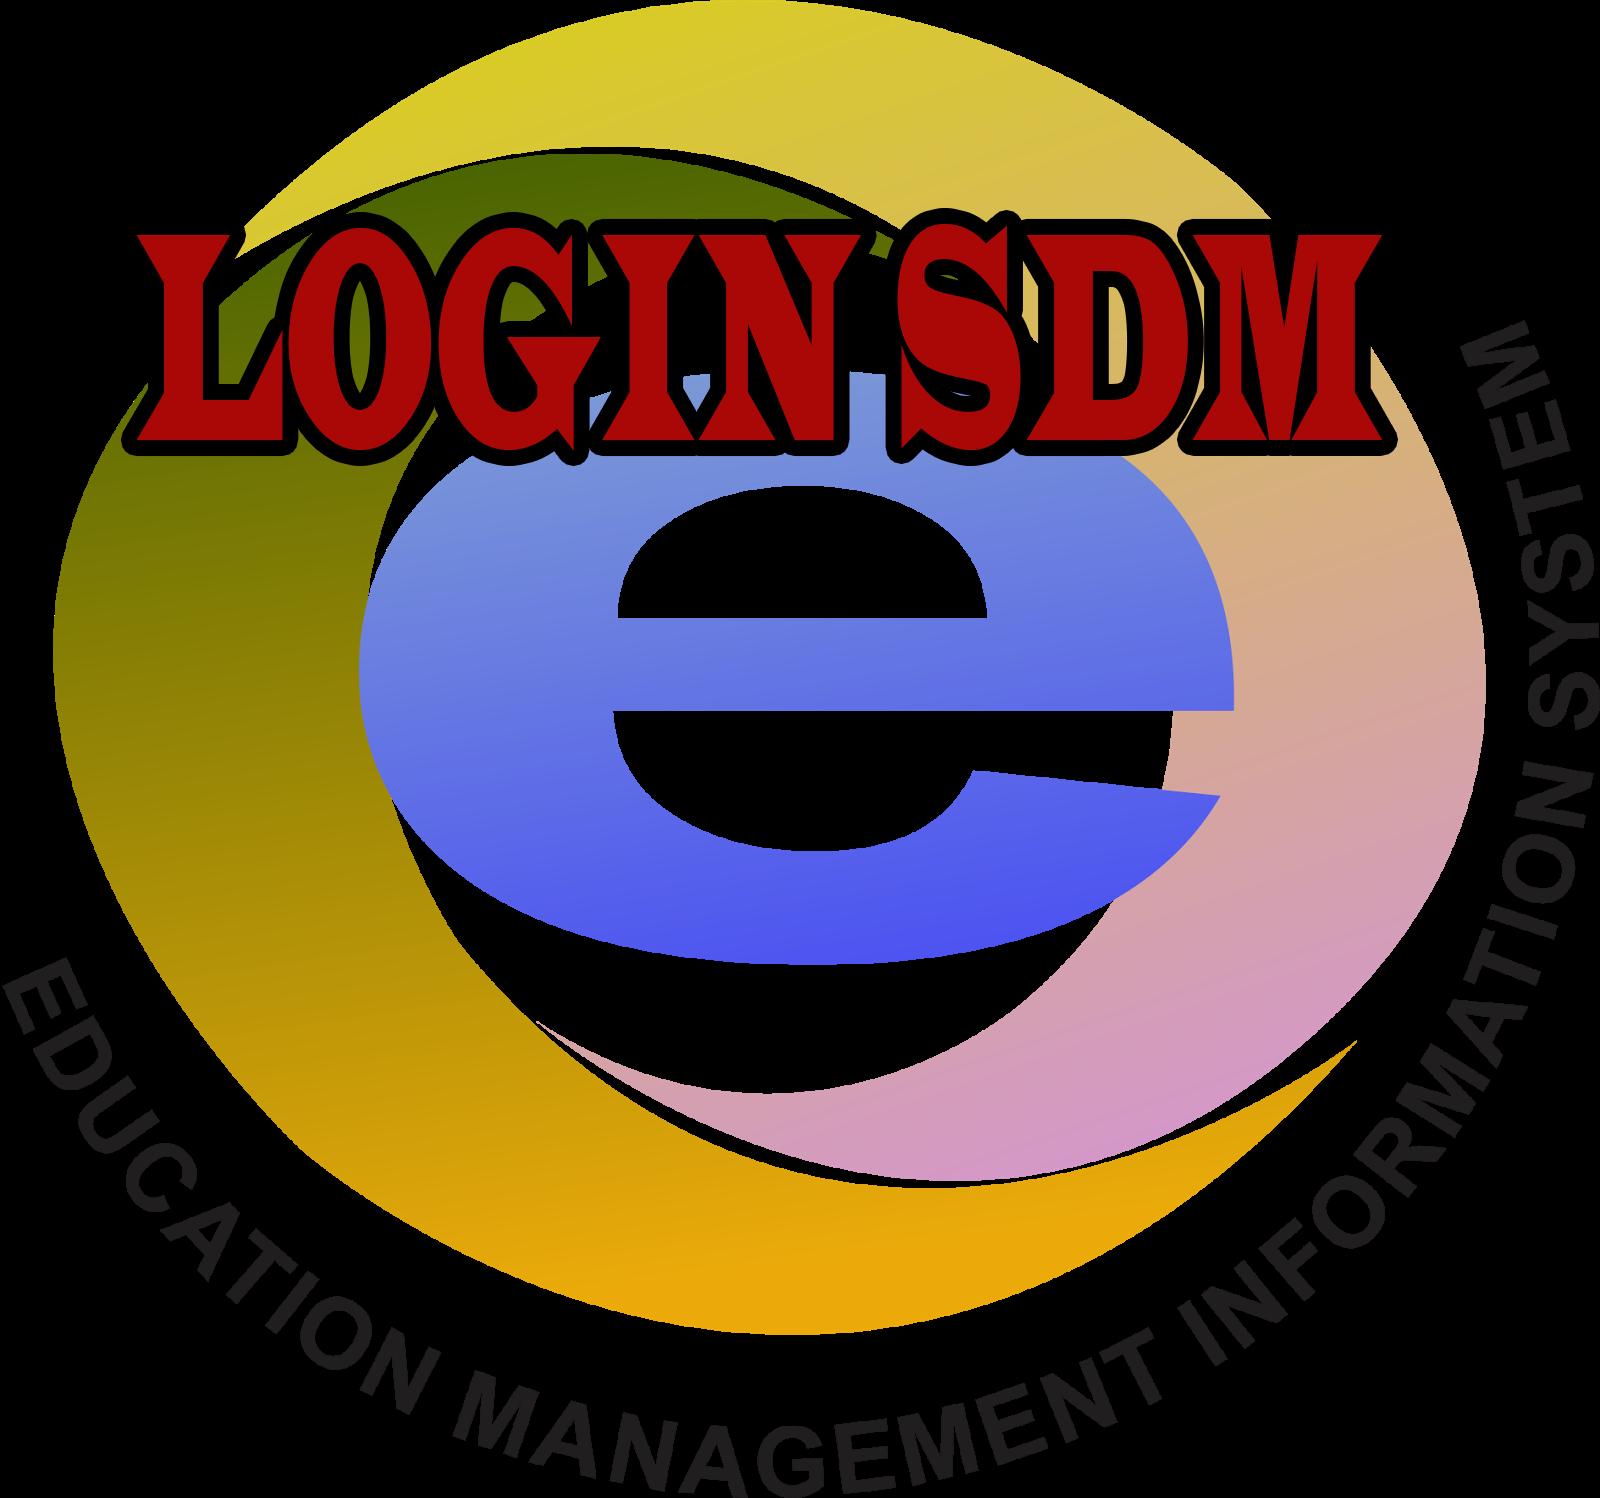 LOGIN SDM